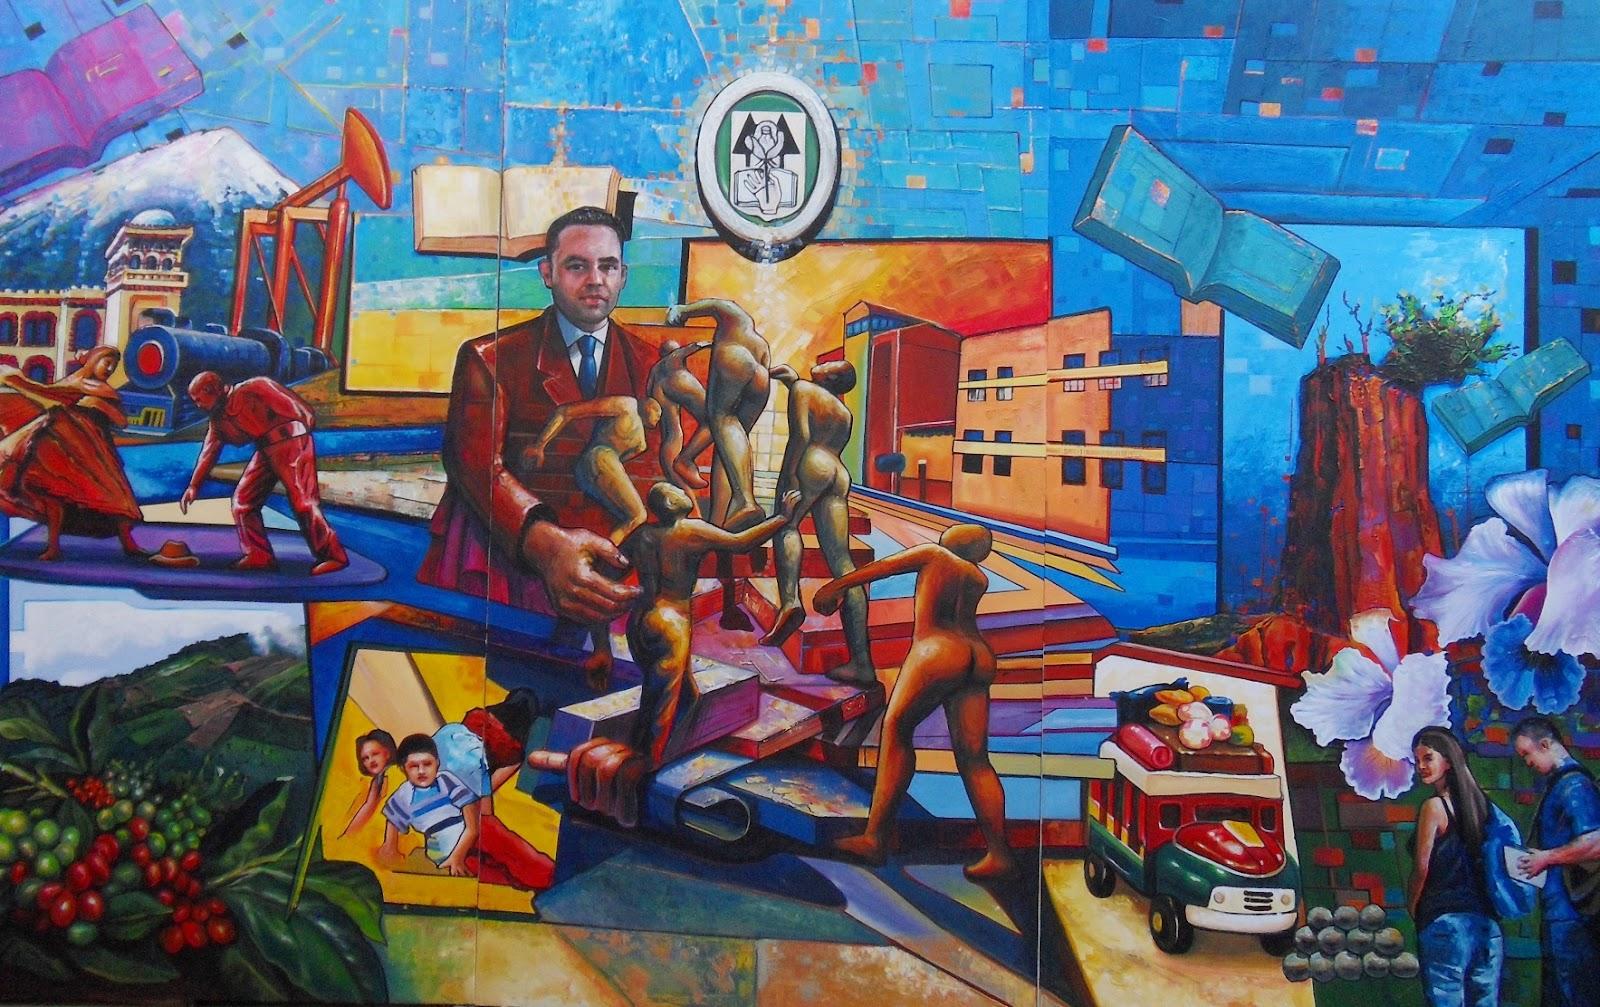 Se Convertir   El Mural Realizado Por Ernesto R  Os Rocha Para